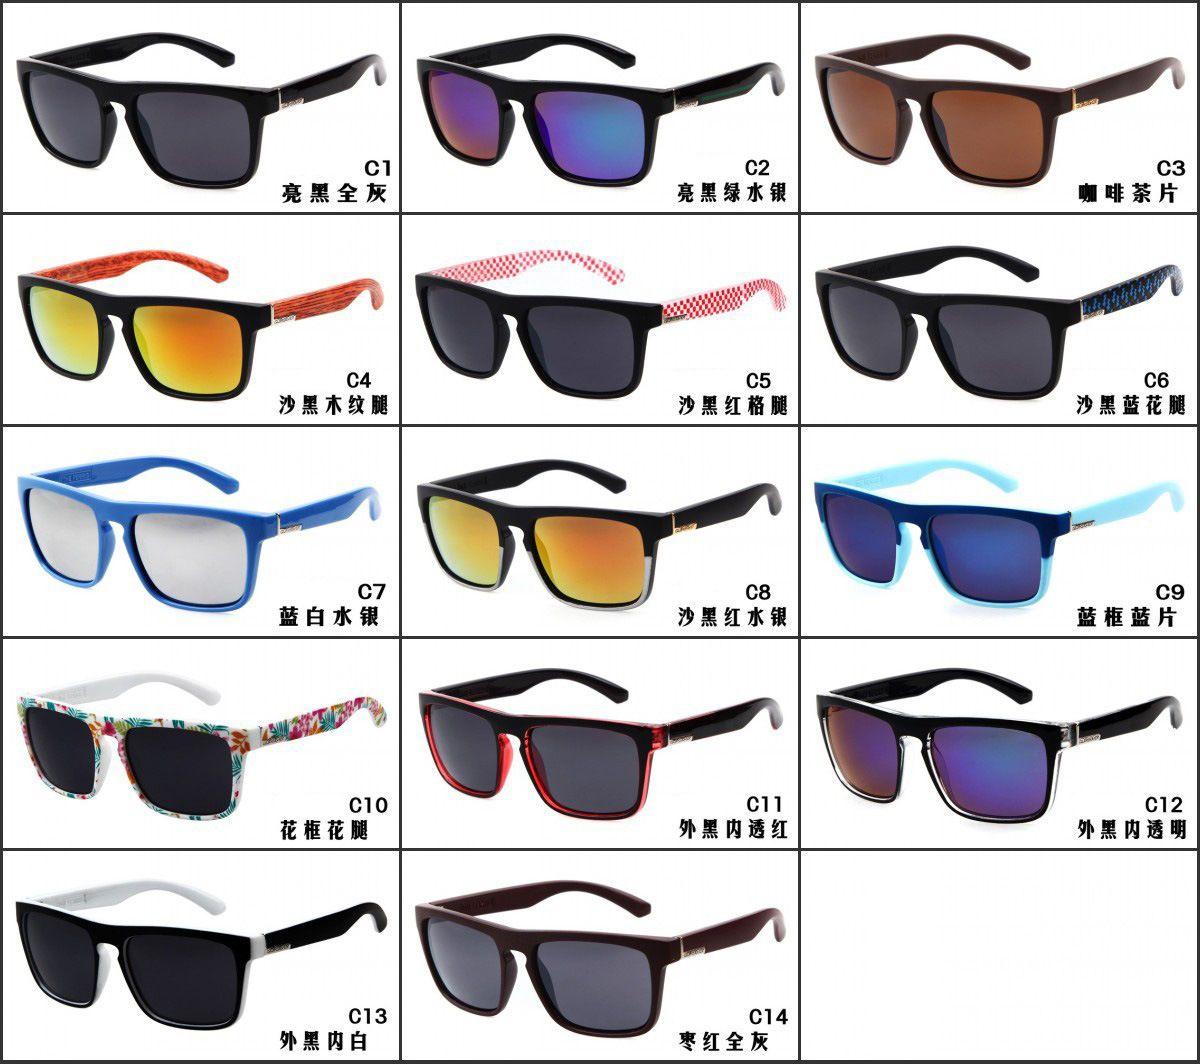 Summer Beach Sunglasses Outdoor Brand Black Skin Snake Sunglasses Movement  Rapidly Riding Surfing Sunglasses For Men Women Prescription Sunglasses  Glasses ... 5ff2afdf6d